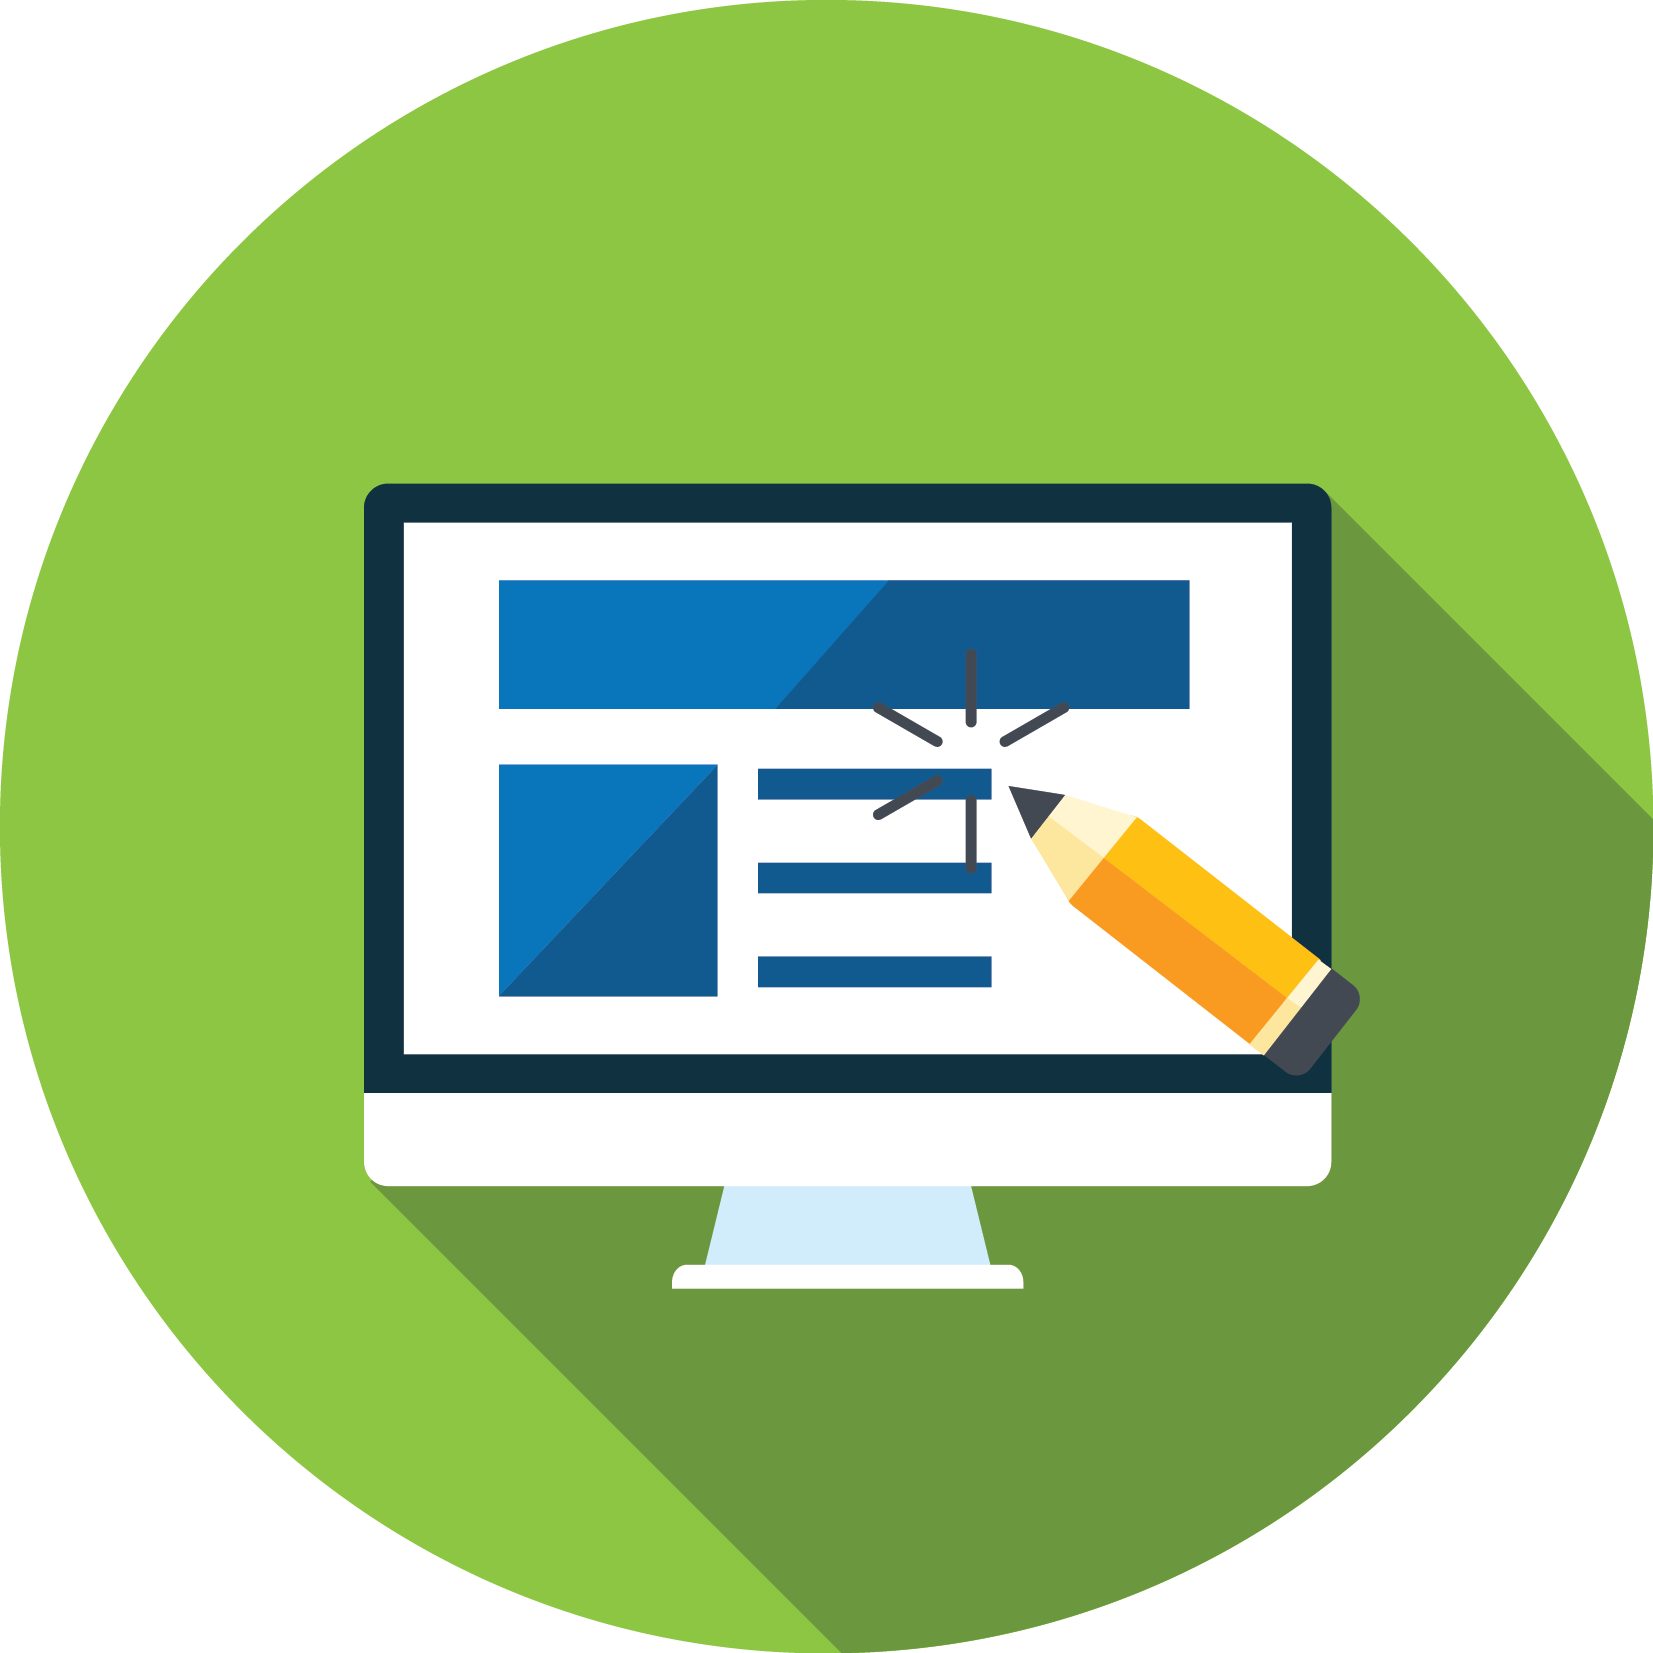 Our design process denver. Website clipart web development